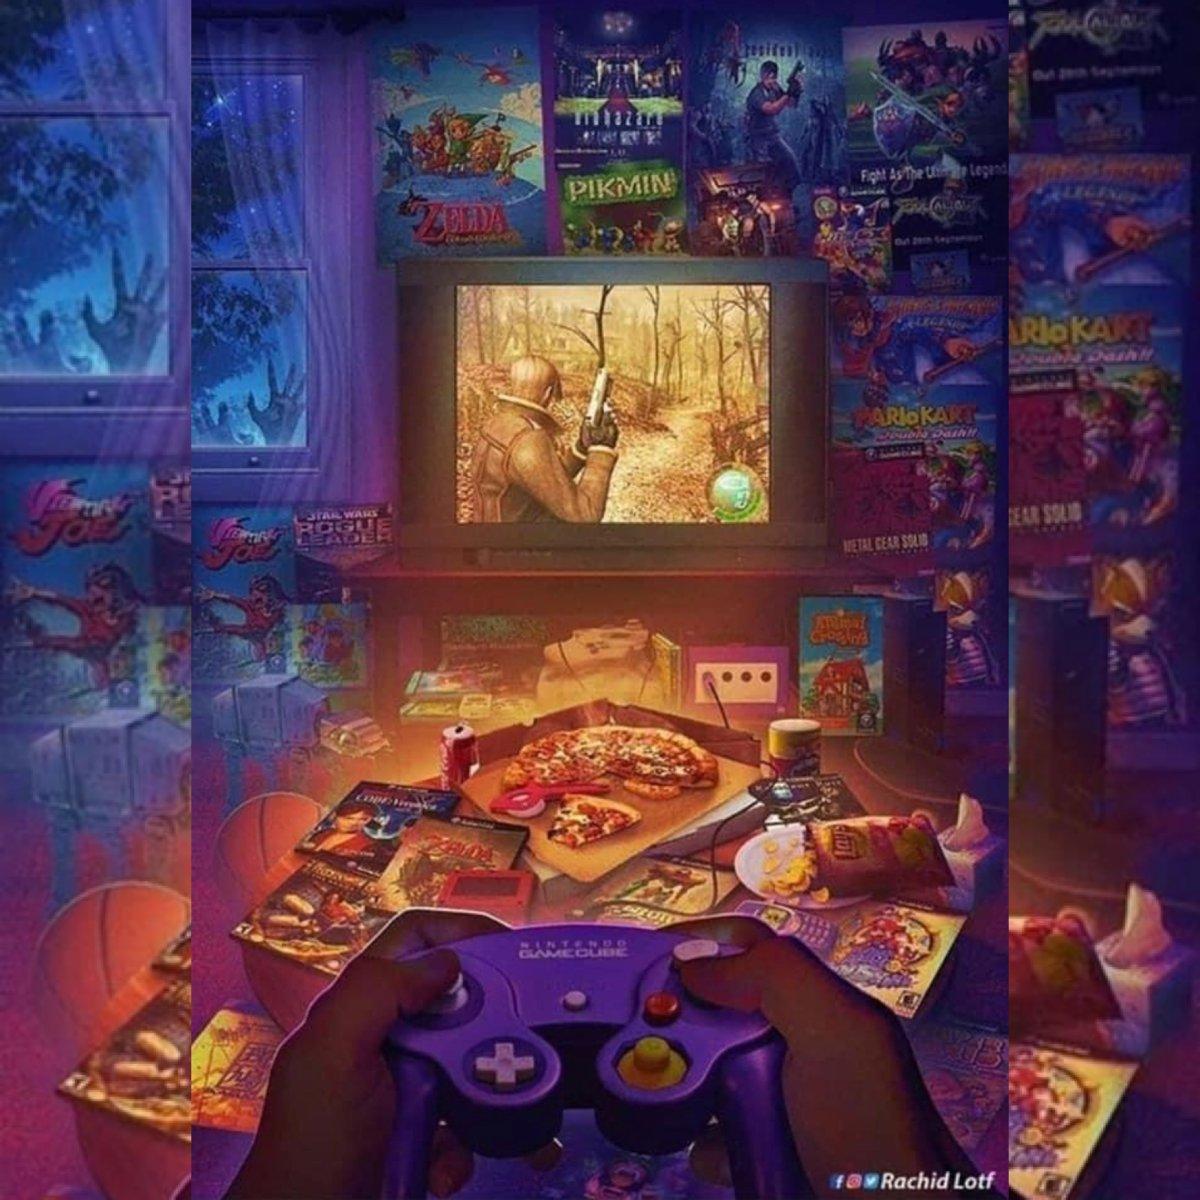 #nintendo #nintendocollection #nintendolife #gamecube #gamer #retrogamer #videogames  #gamertalk #geekgamer #classicgaming #gaming #gamersunite #retrocollector #gamerlife #retrogaming #retro #gaminglifestyle #gamingworld #gamingcommunity #retrogames #gaminglife #jlsgamingpic.twitter.com/m8EuZmKBjy